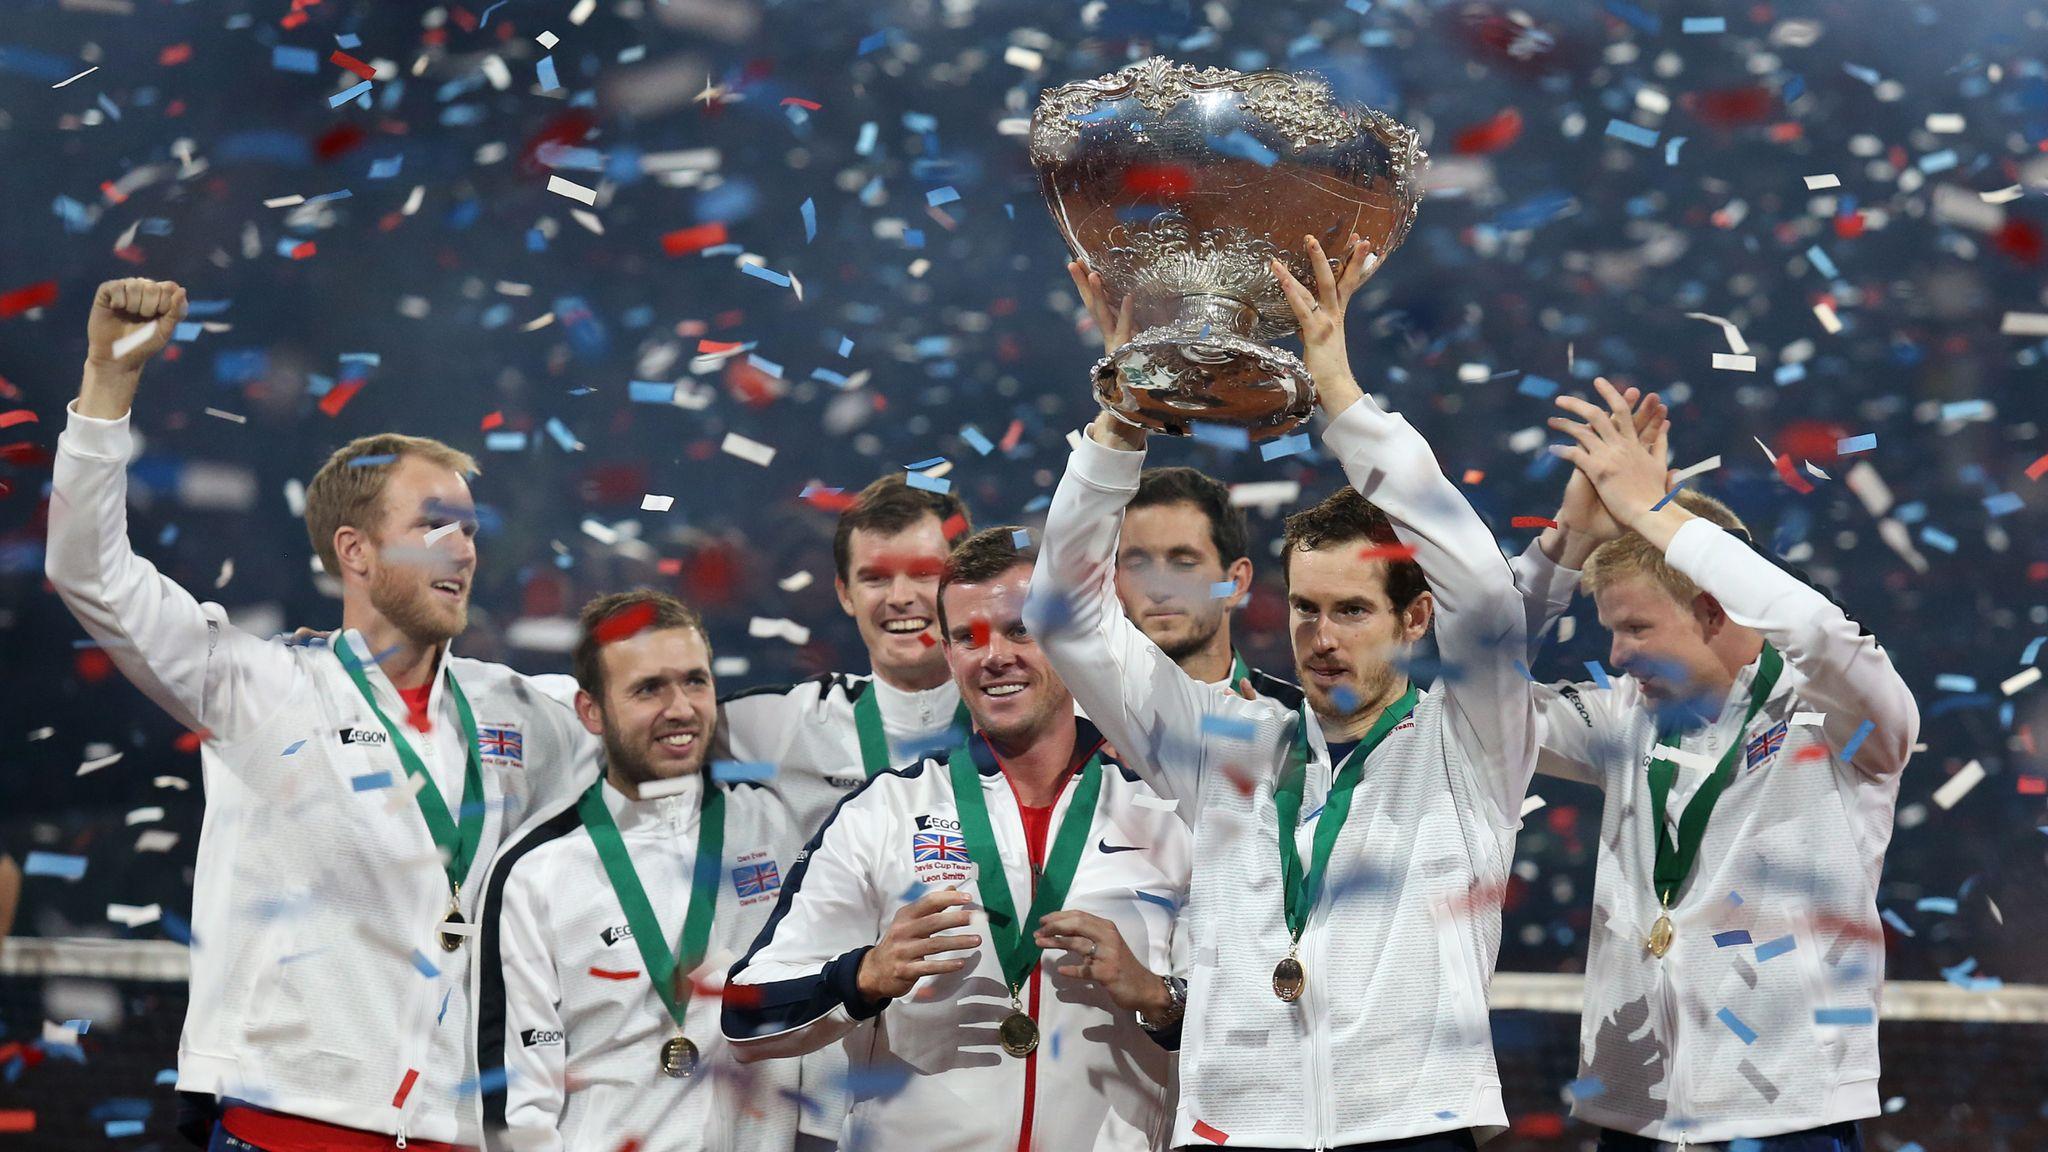 Stefanos Tsitsipas beats Dominic Thiem in thriller to win ATP Finals in London